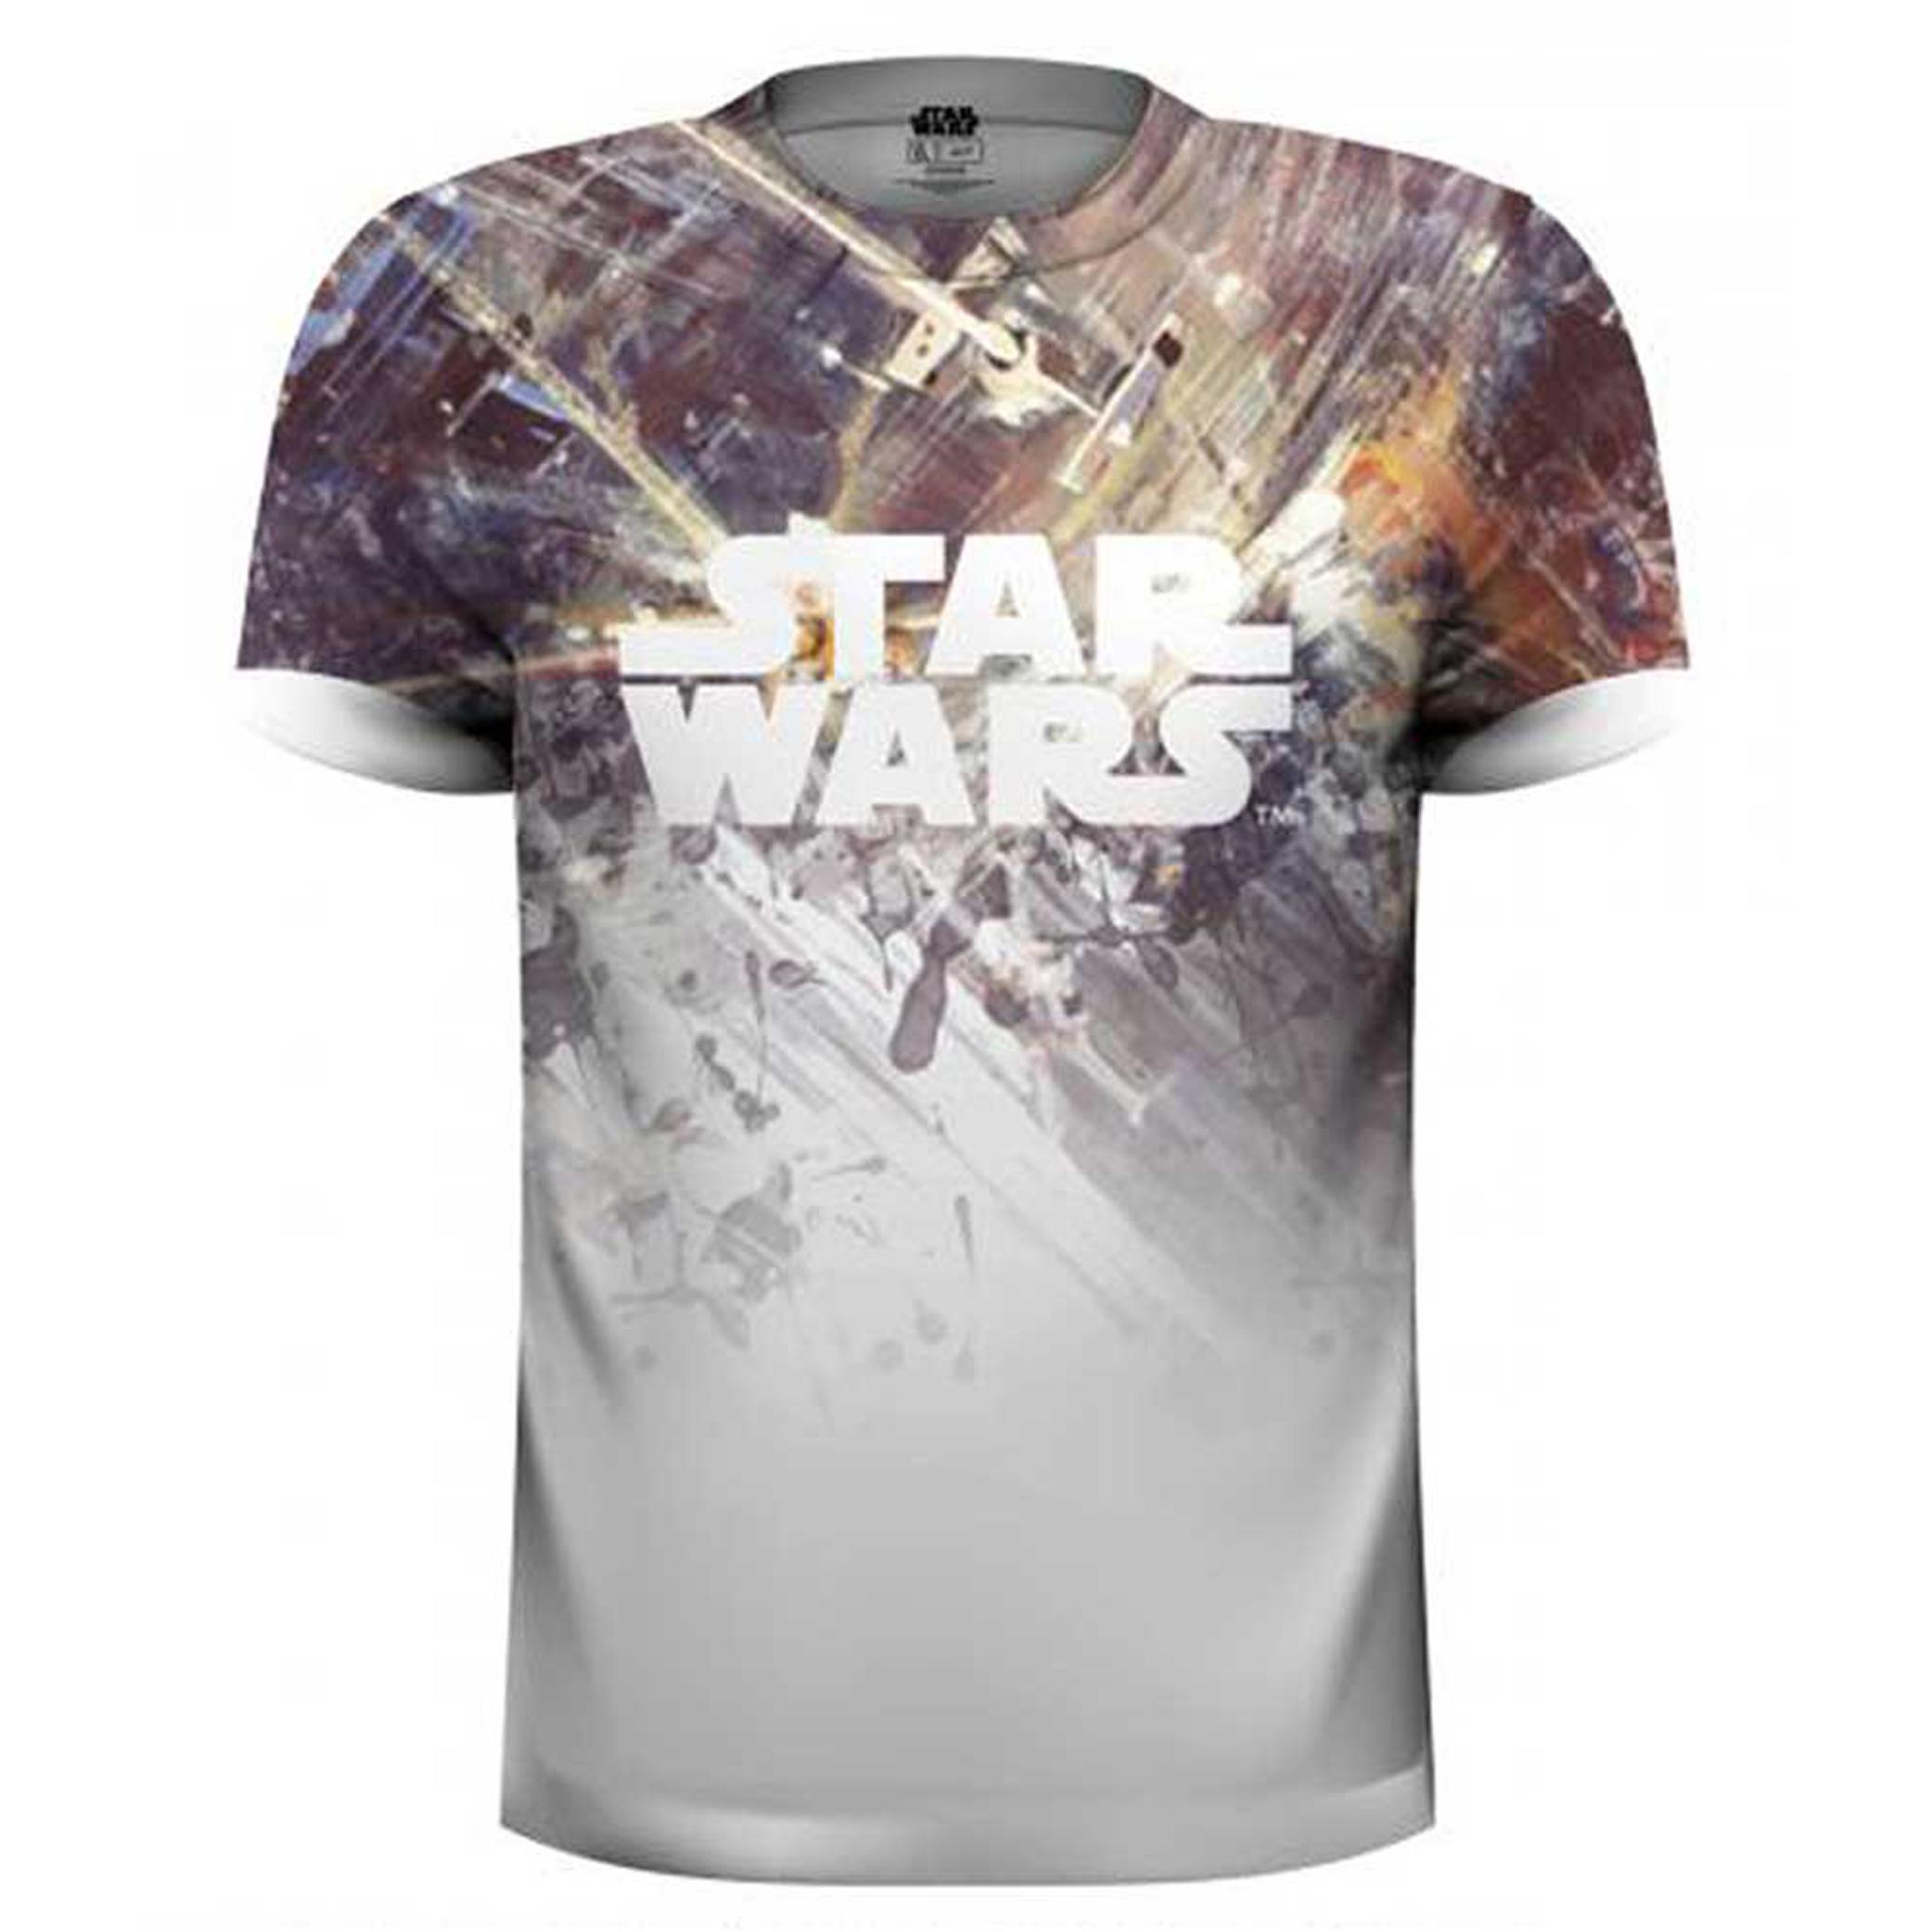 Star Wars Mens//Unisex T-Shirt X-Wing Fighter